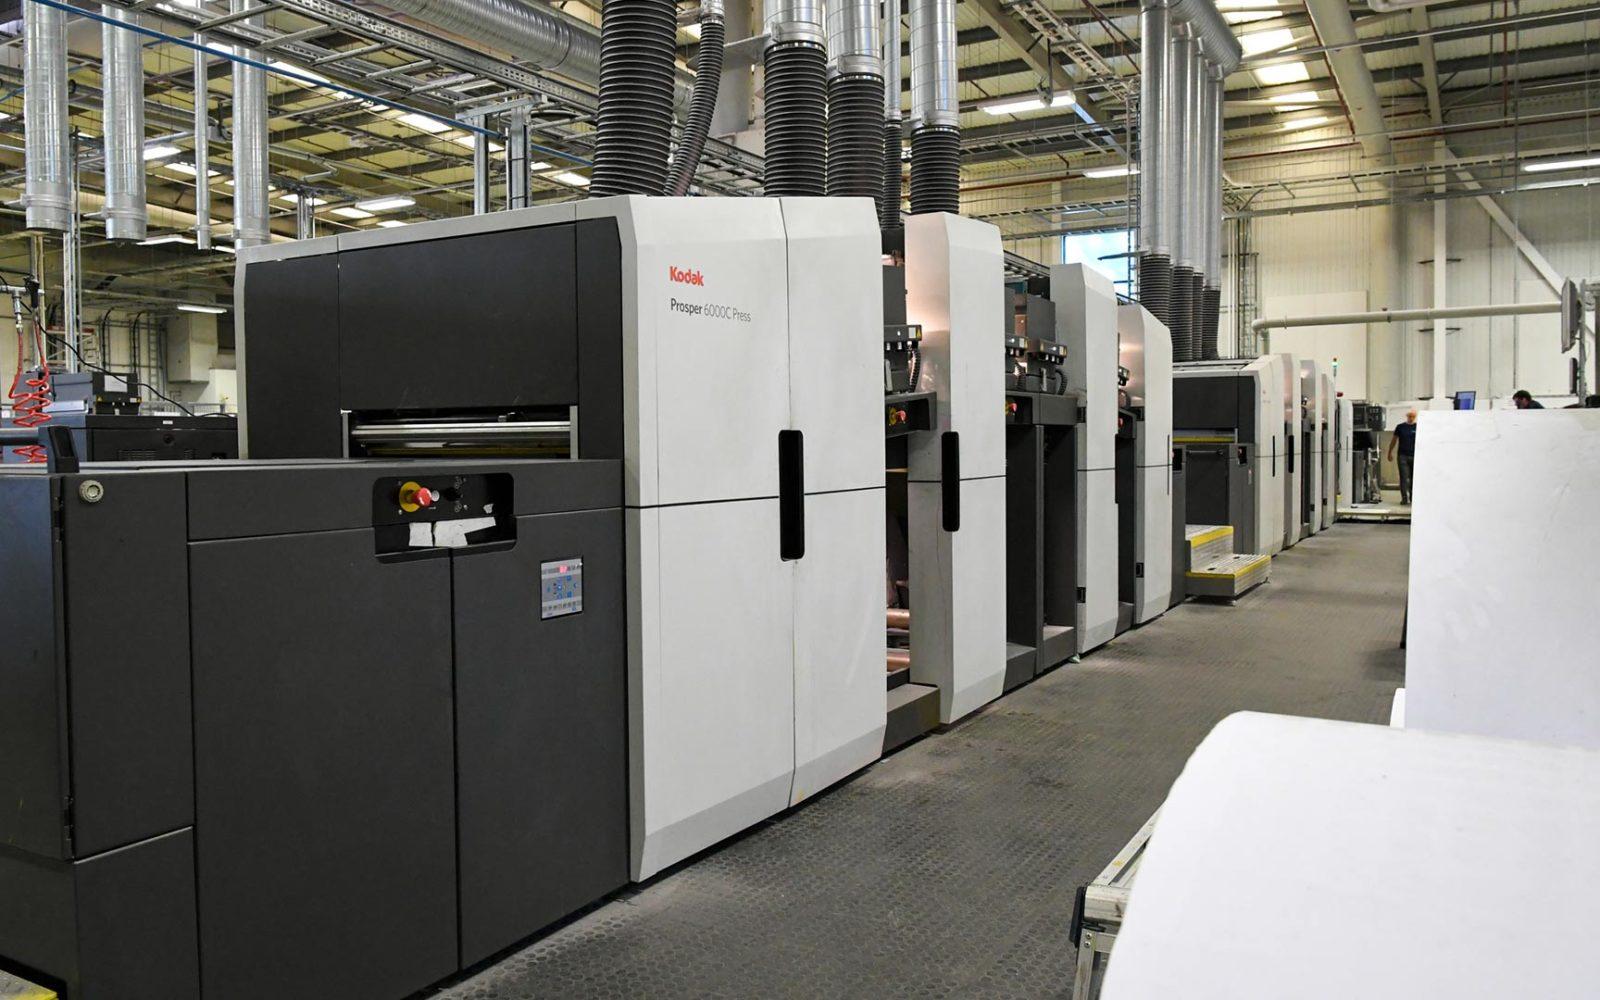 kodak-printing-press